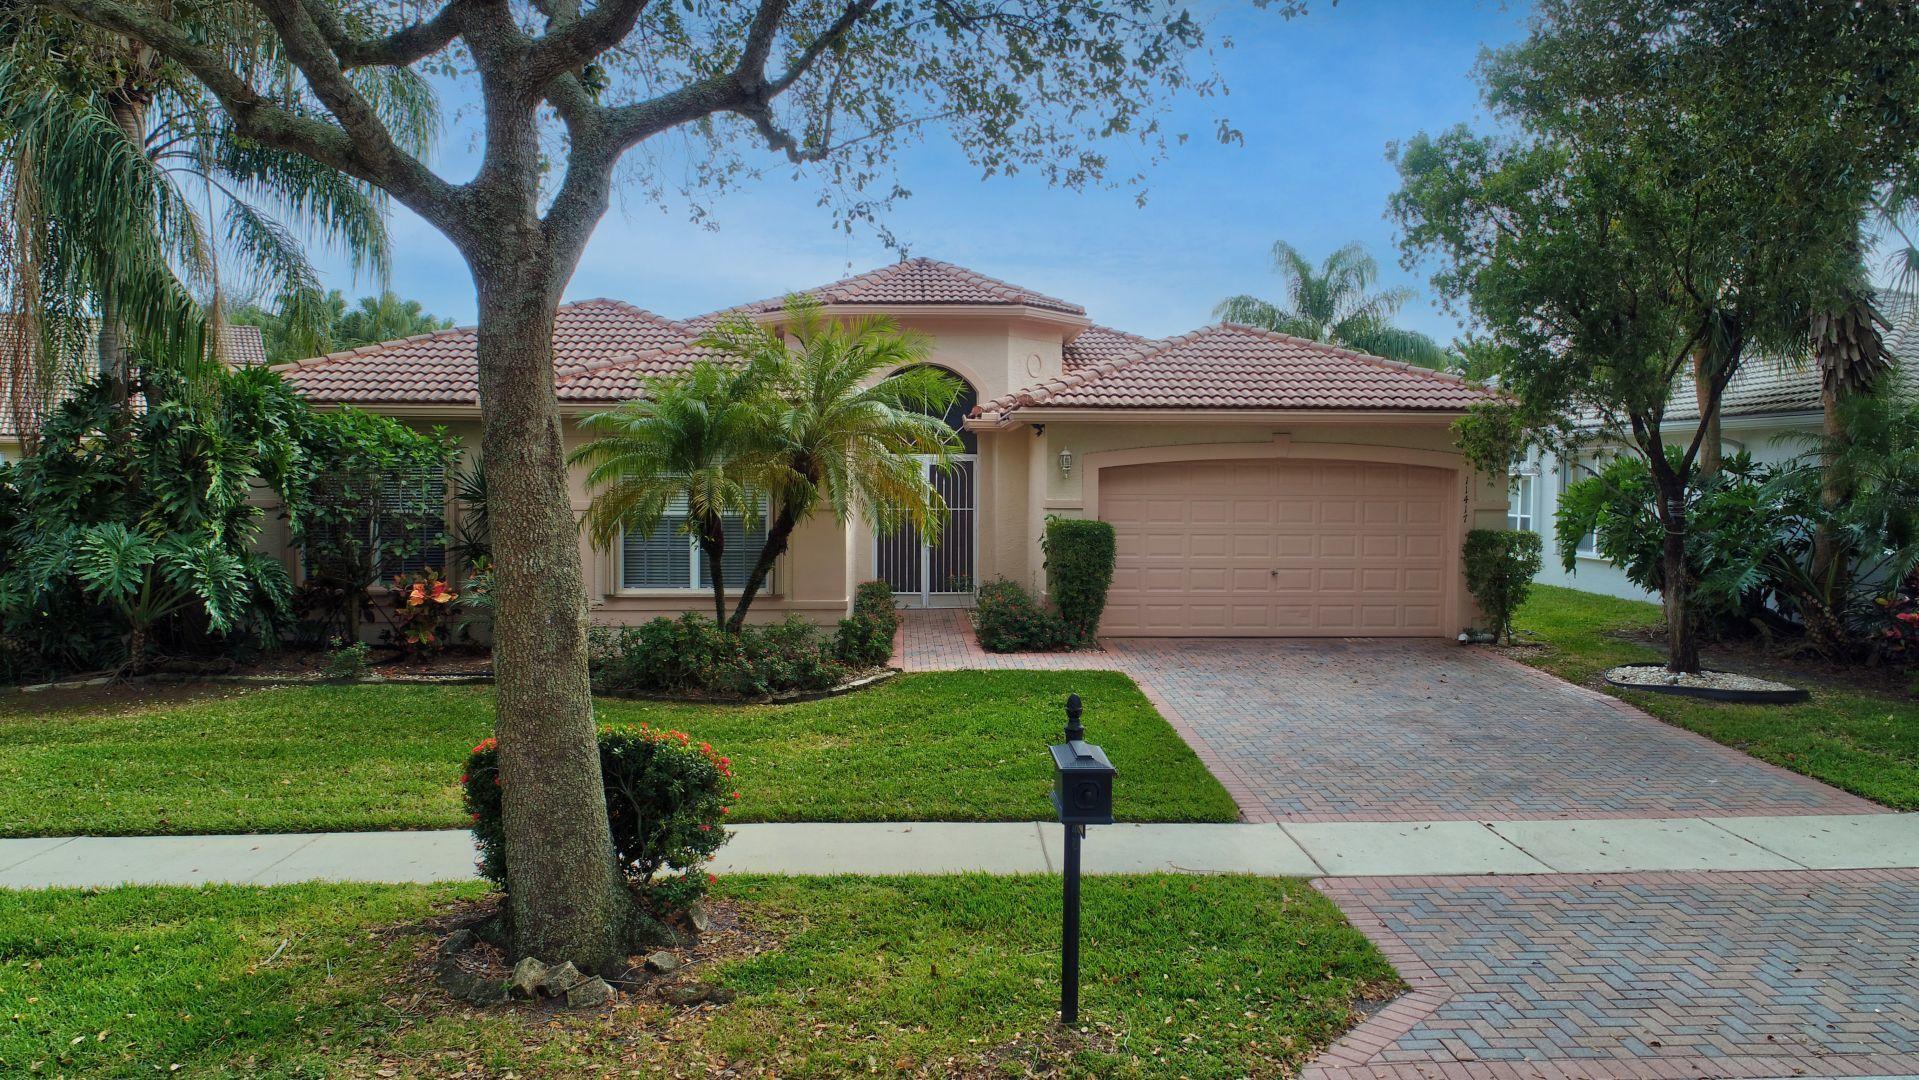 Photo of 11417 Ohanu Circle, Boynton Beach, FL 33437